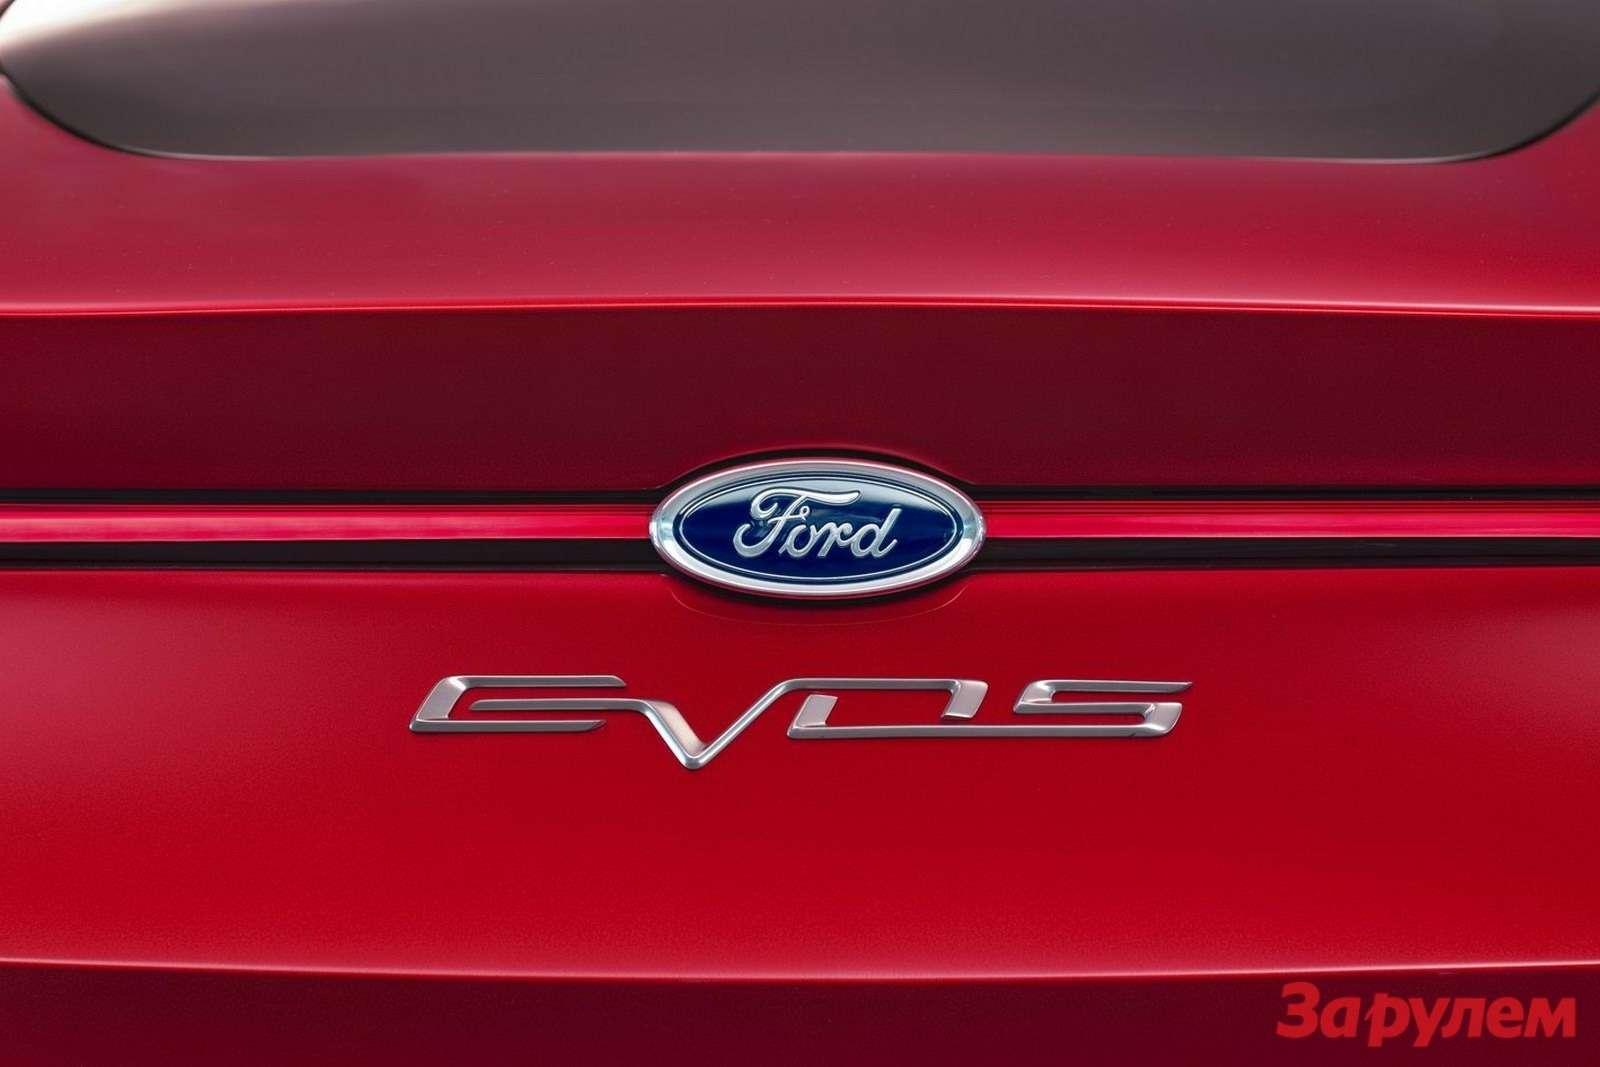 Ford-EVOS-Concpet-65